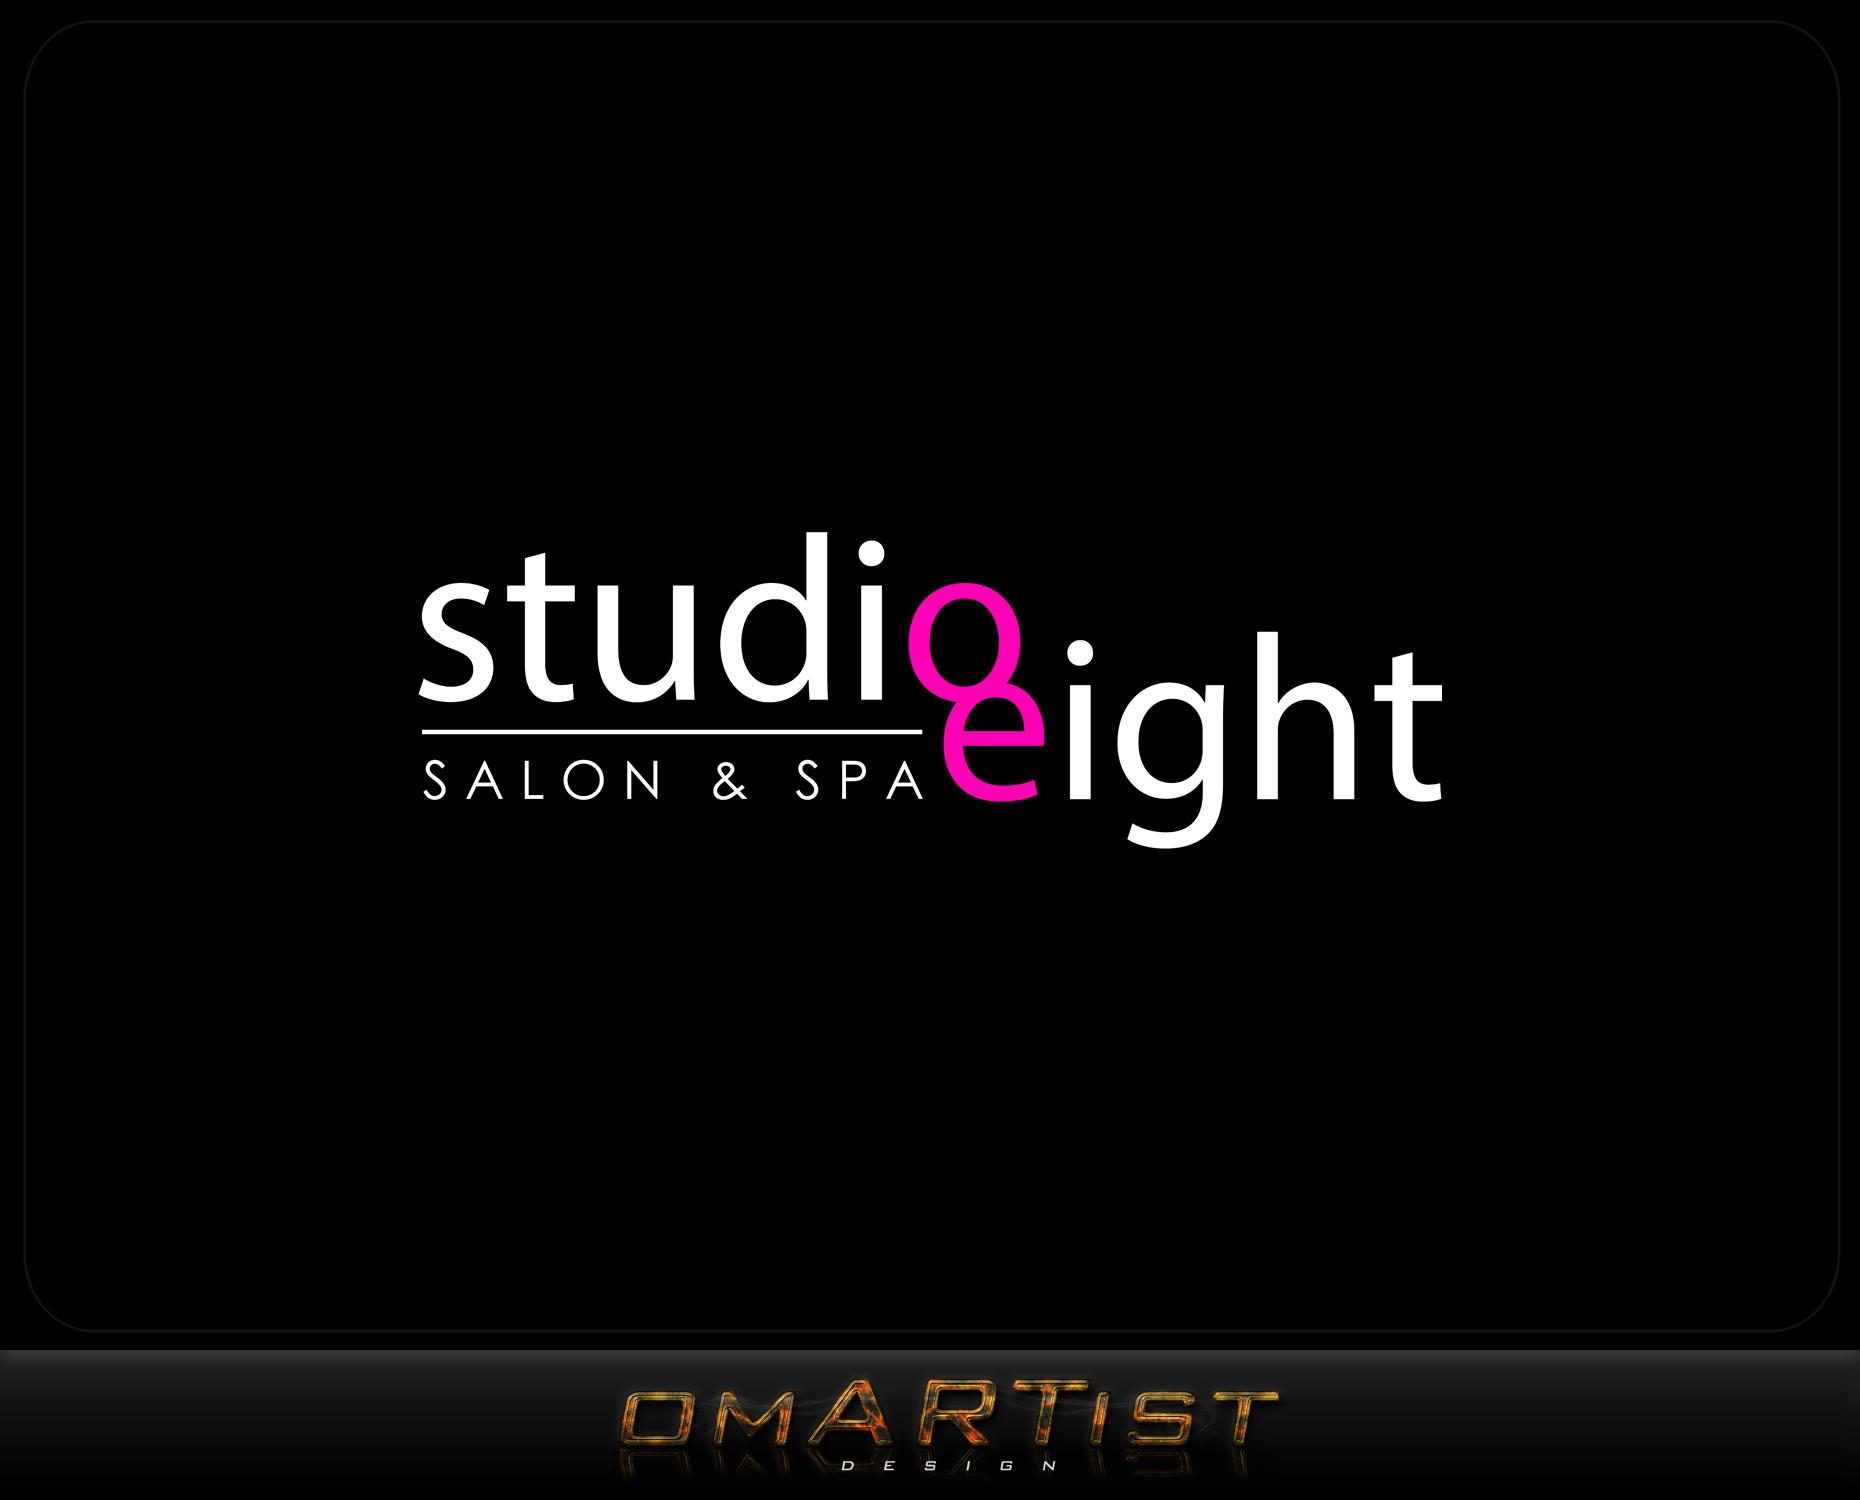 Logo Design by omARTist - Entry No. 91 in the Logo Design Contest Captivating Logo Design for studio eight salon & spa.